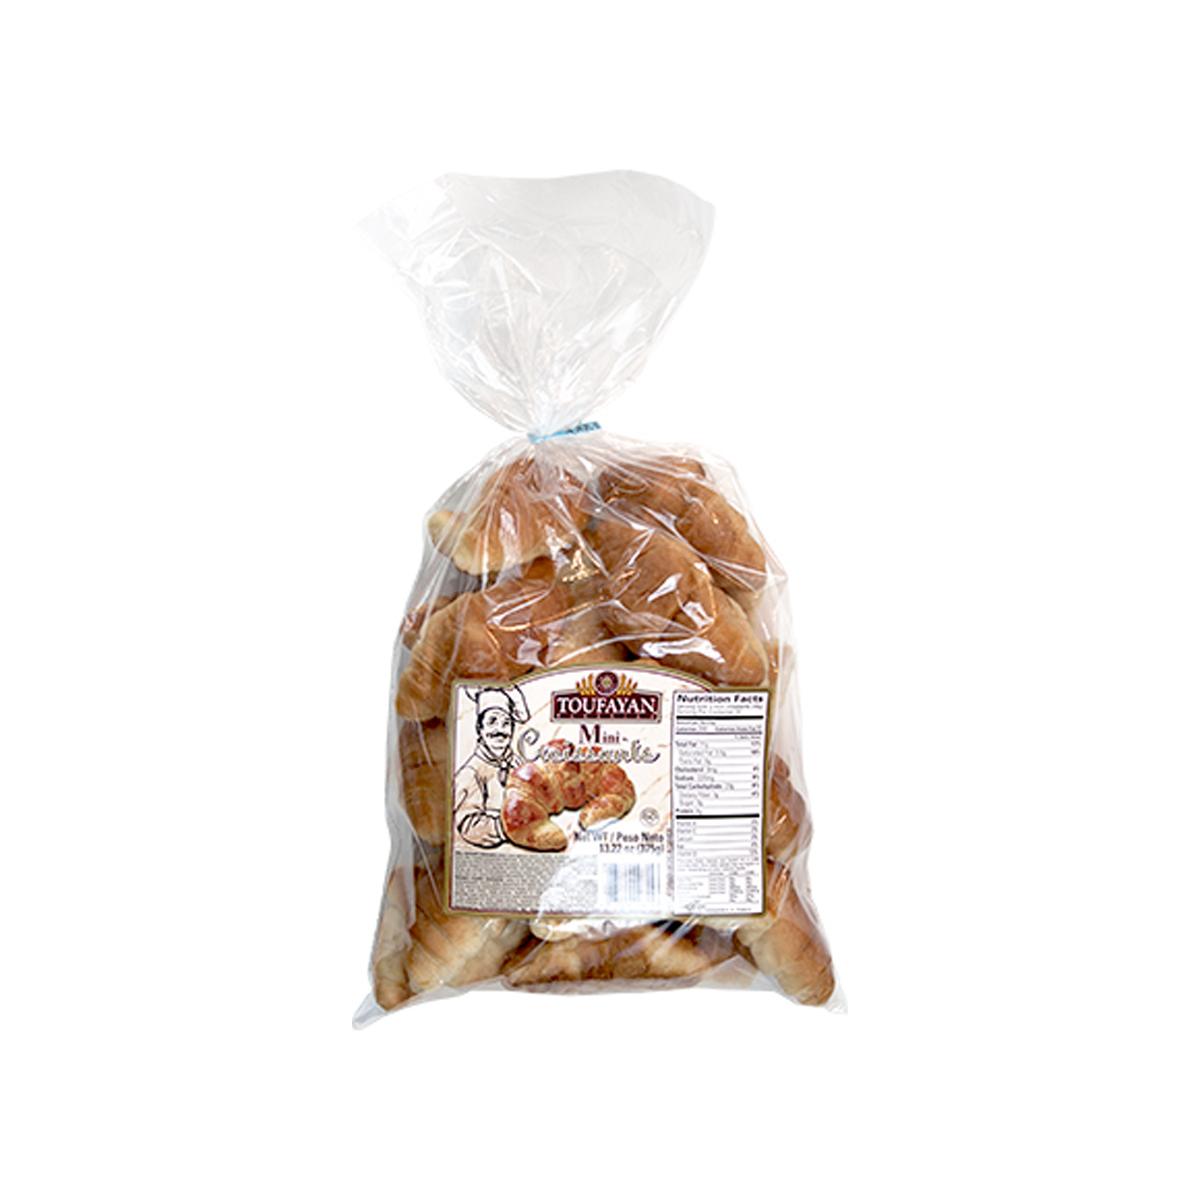 Mini Croissant 12 oz Toufayan